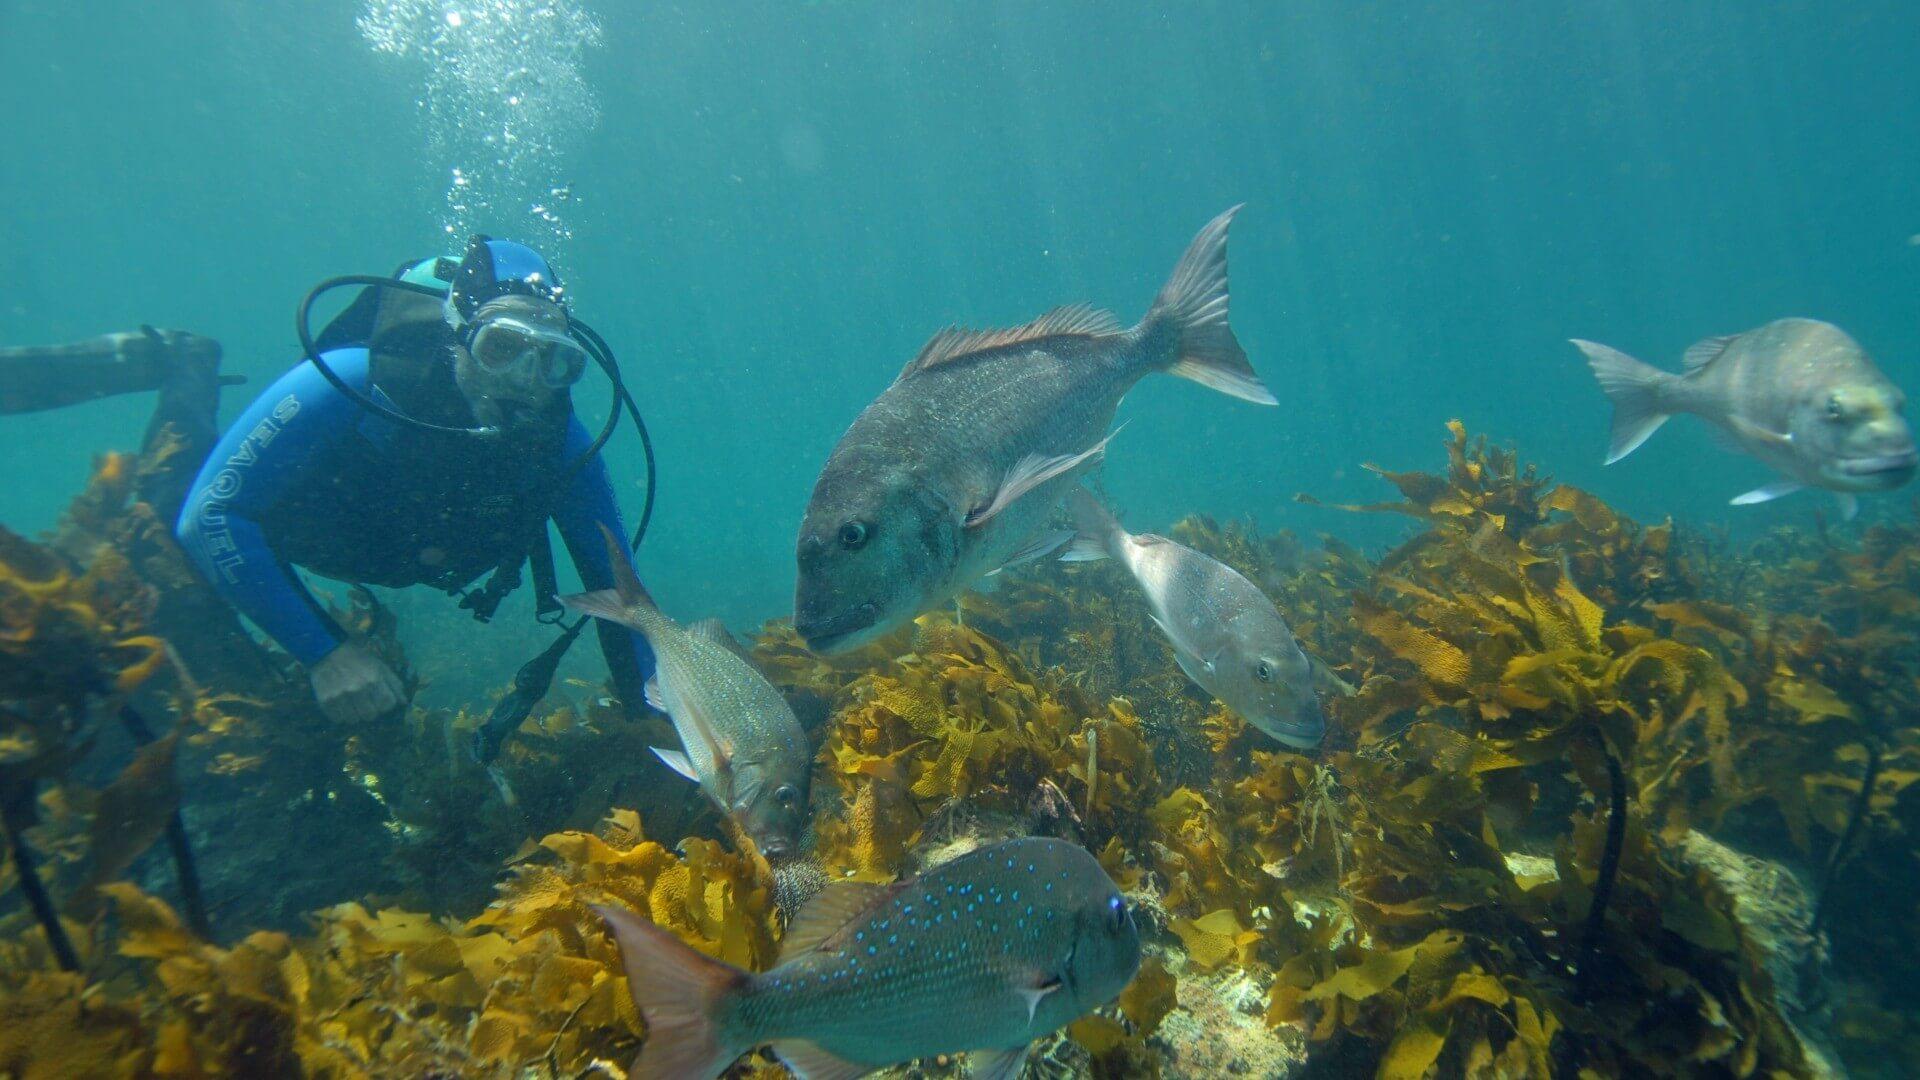 Goat Island Marine Reserve - Matakana Coast